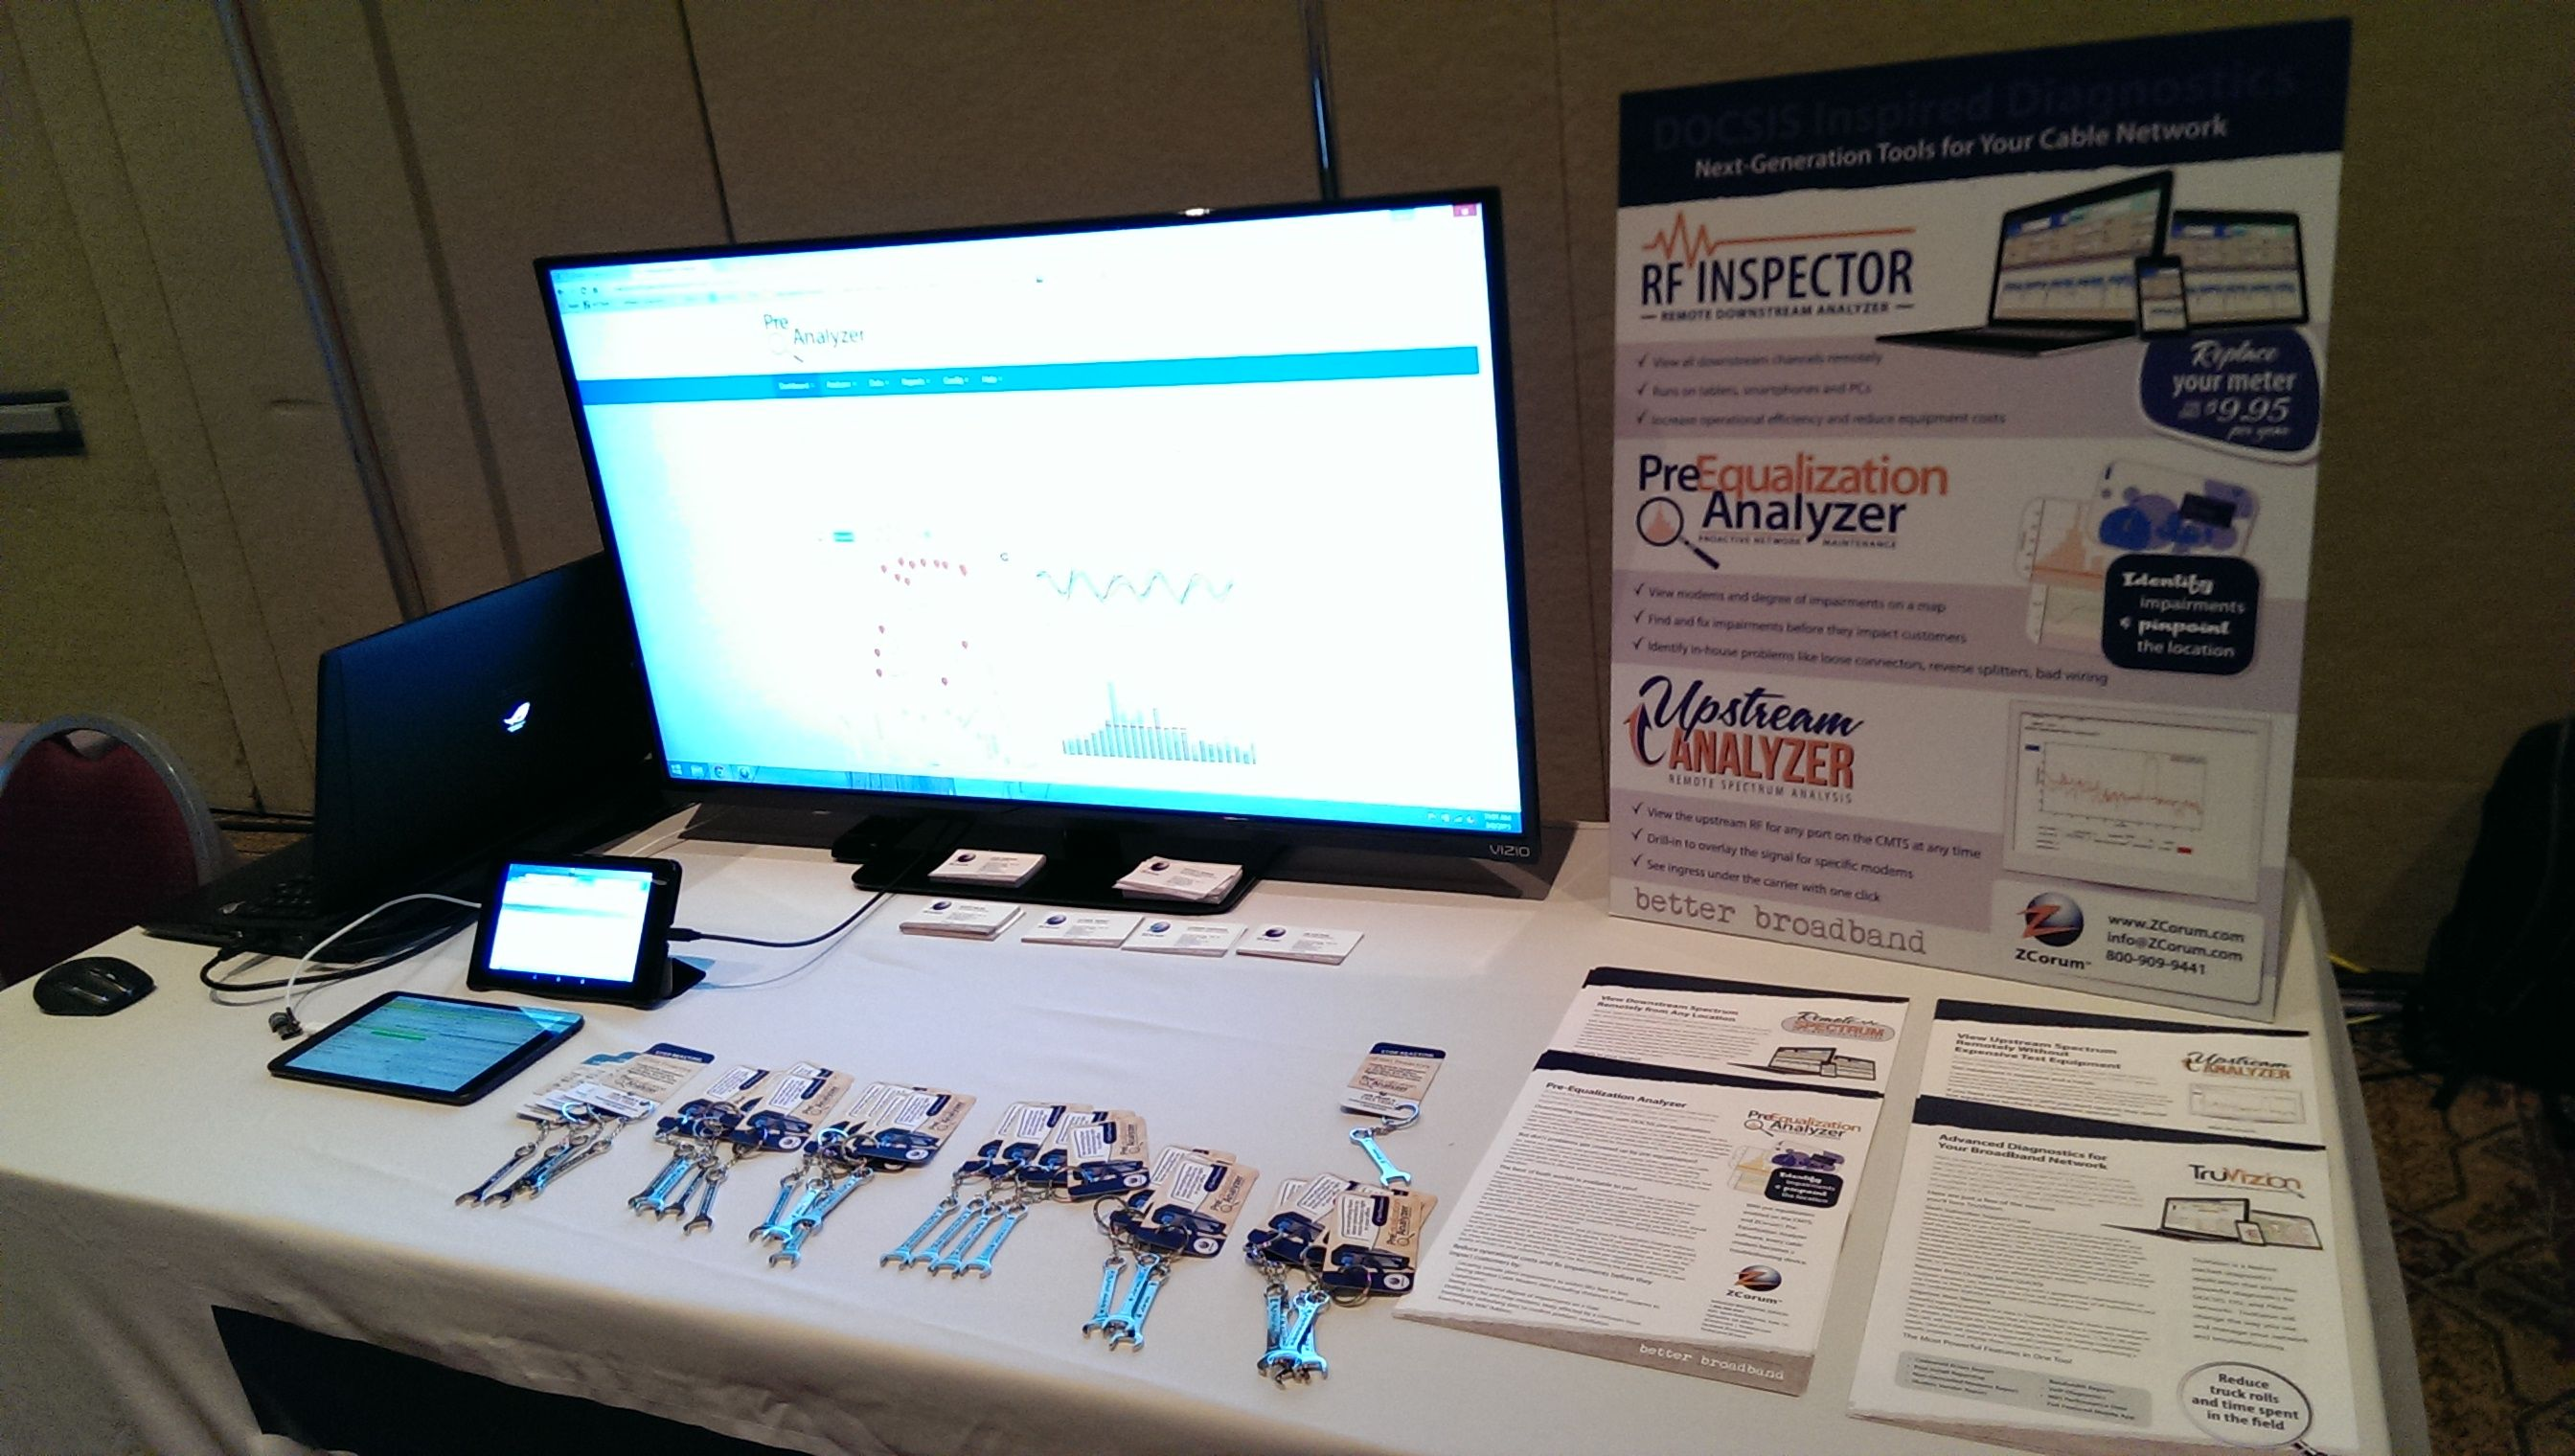 ZCorum demo table at CableLabs Winter Conference in Orlando, FL.